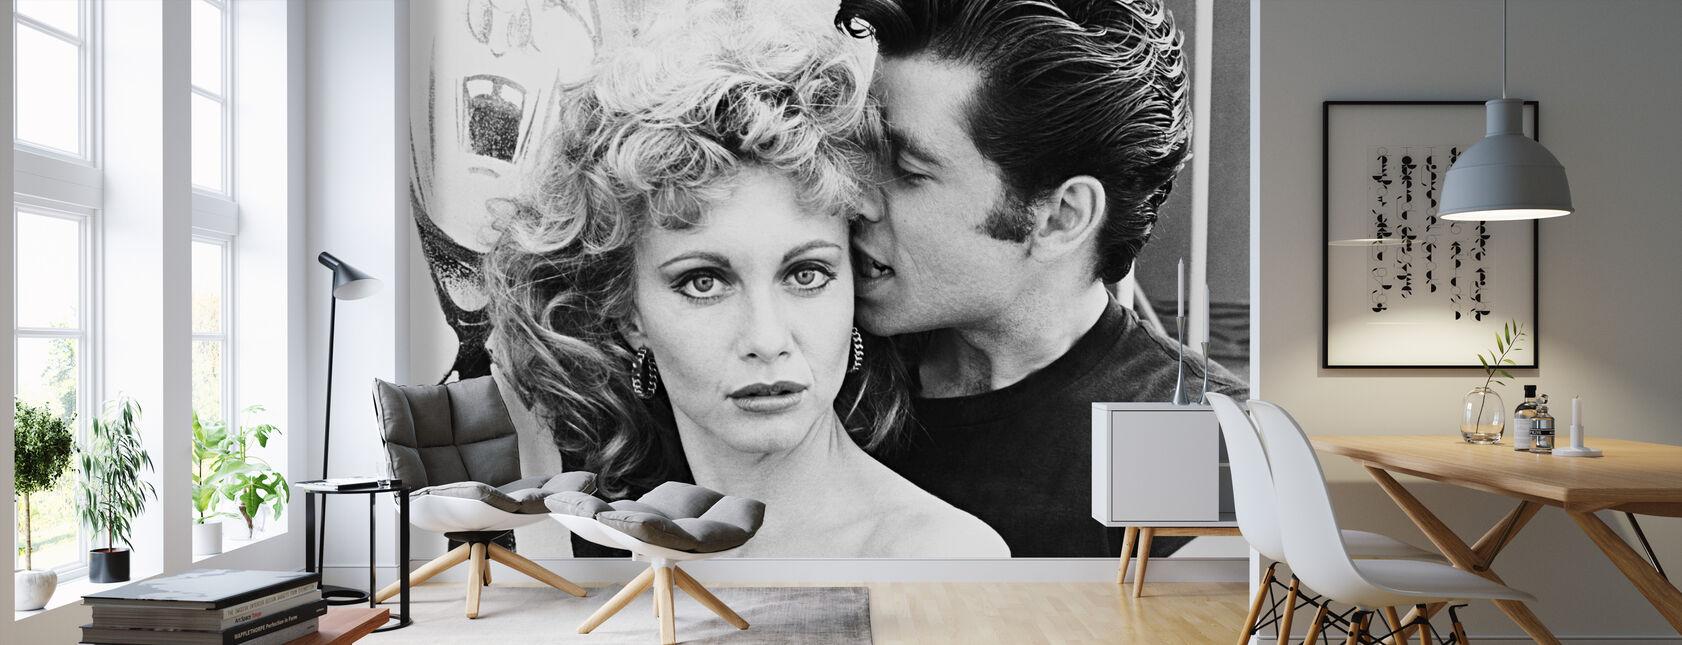 Grease - John Travolta and Olivia Newton John - Wallpaper - Living Room